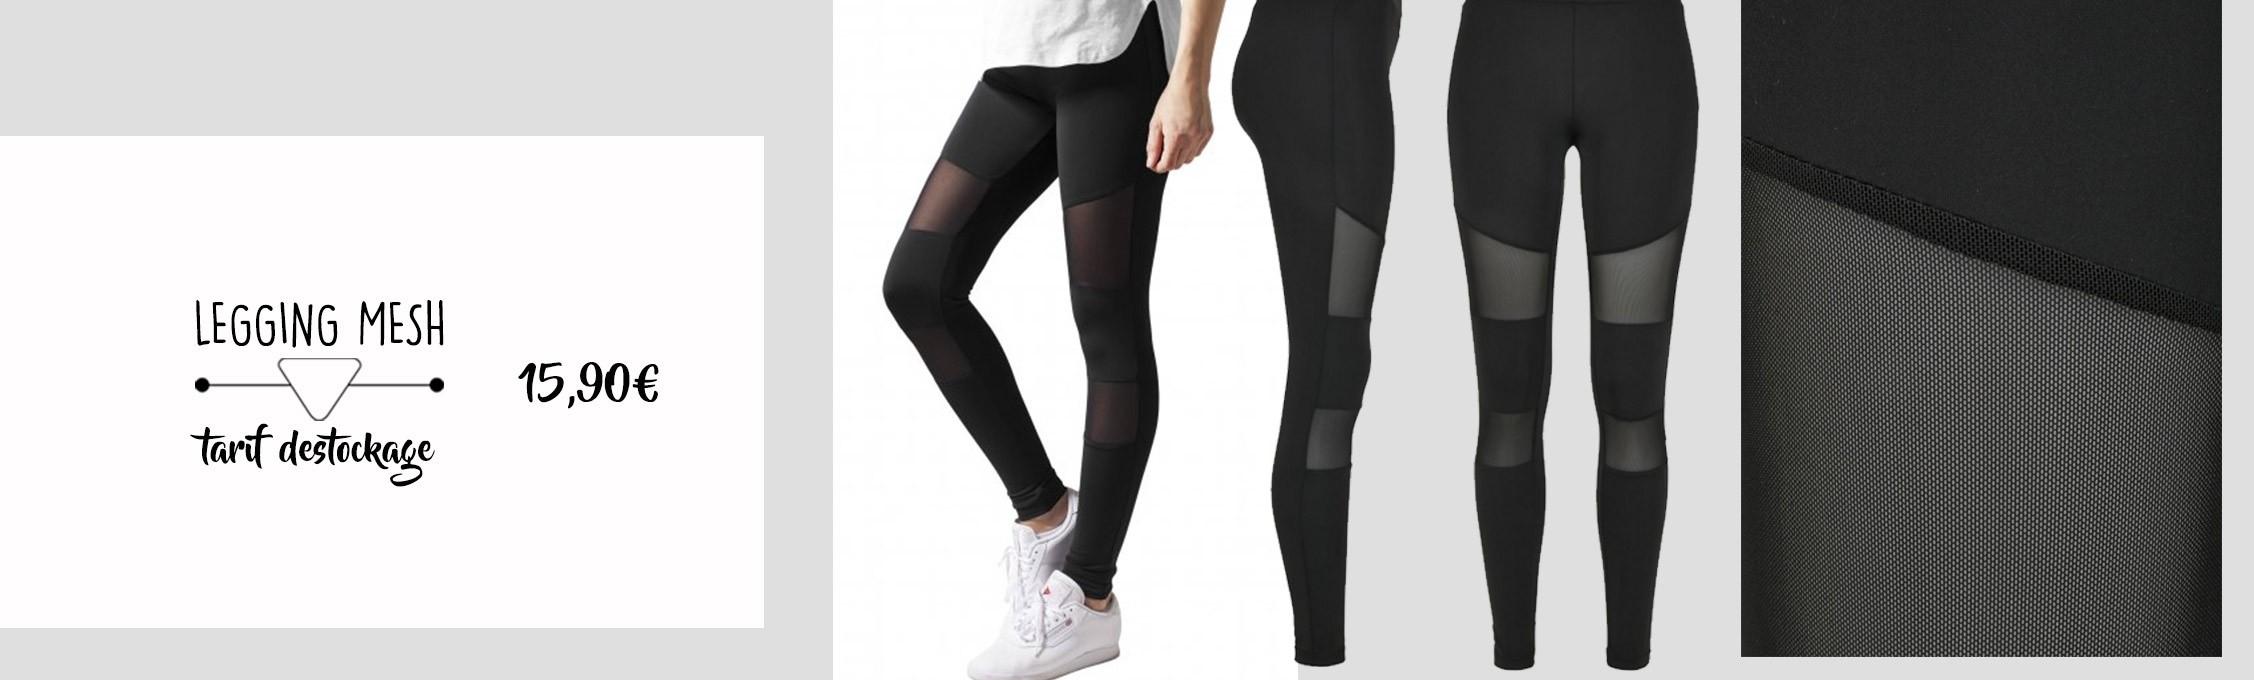 Destockage leggings mesh urban